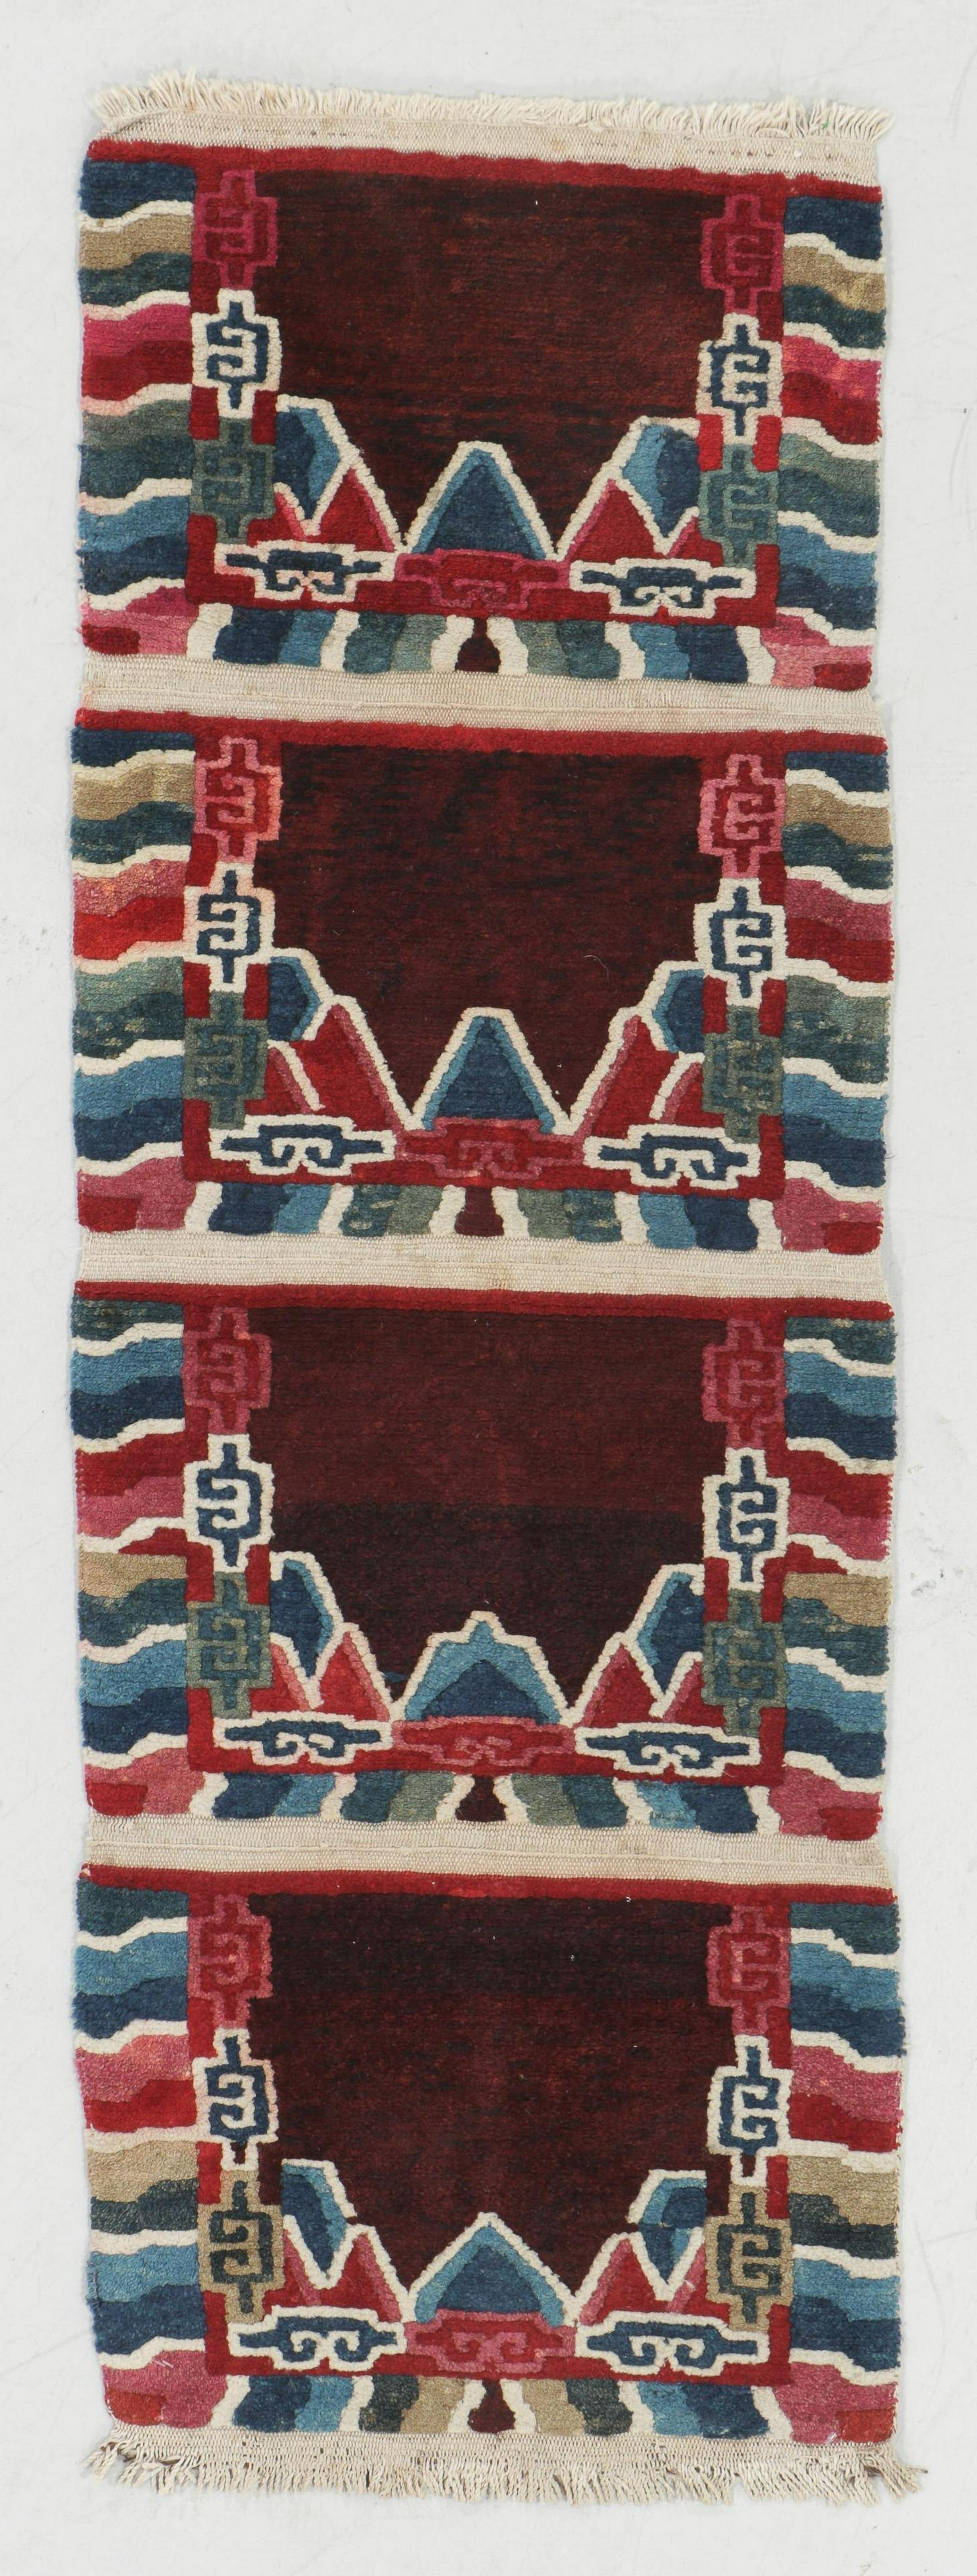 Set of 4 Connected Tibetan Temple Meditation Mats